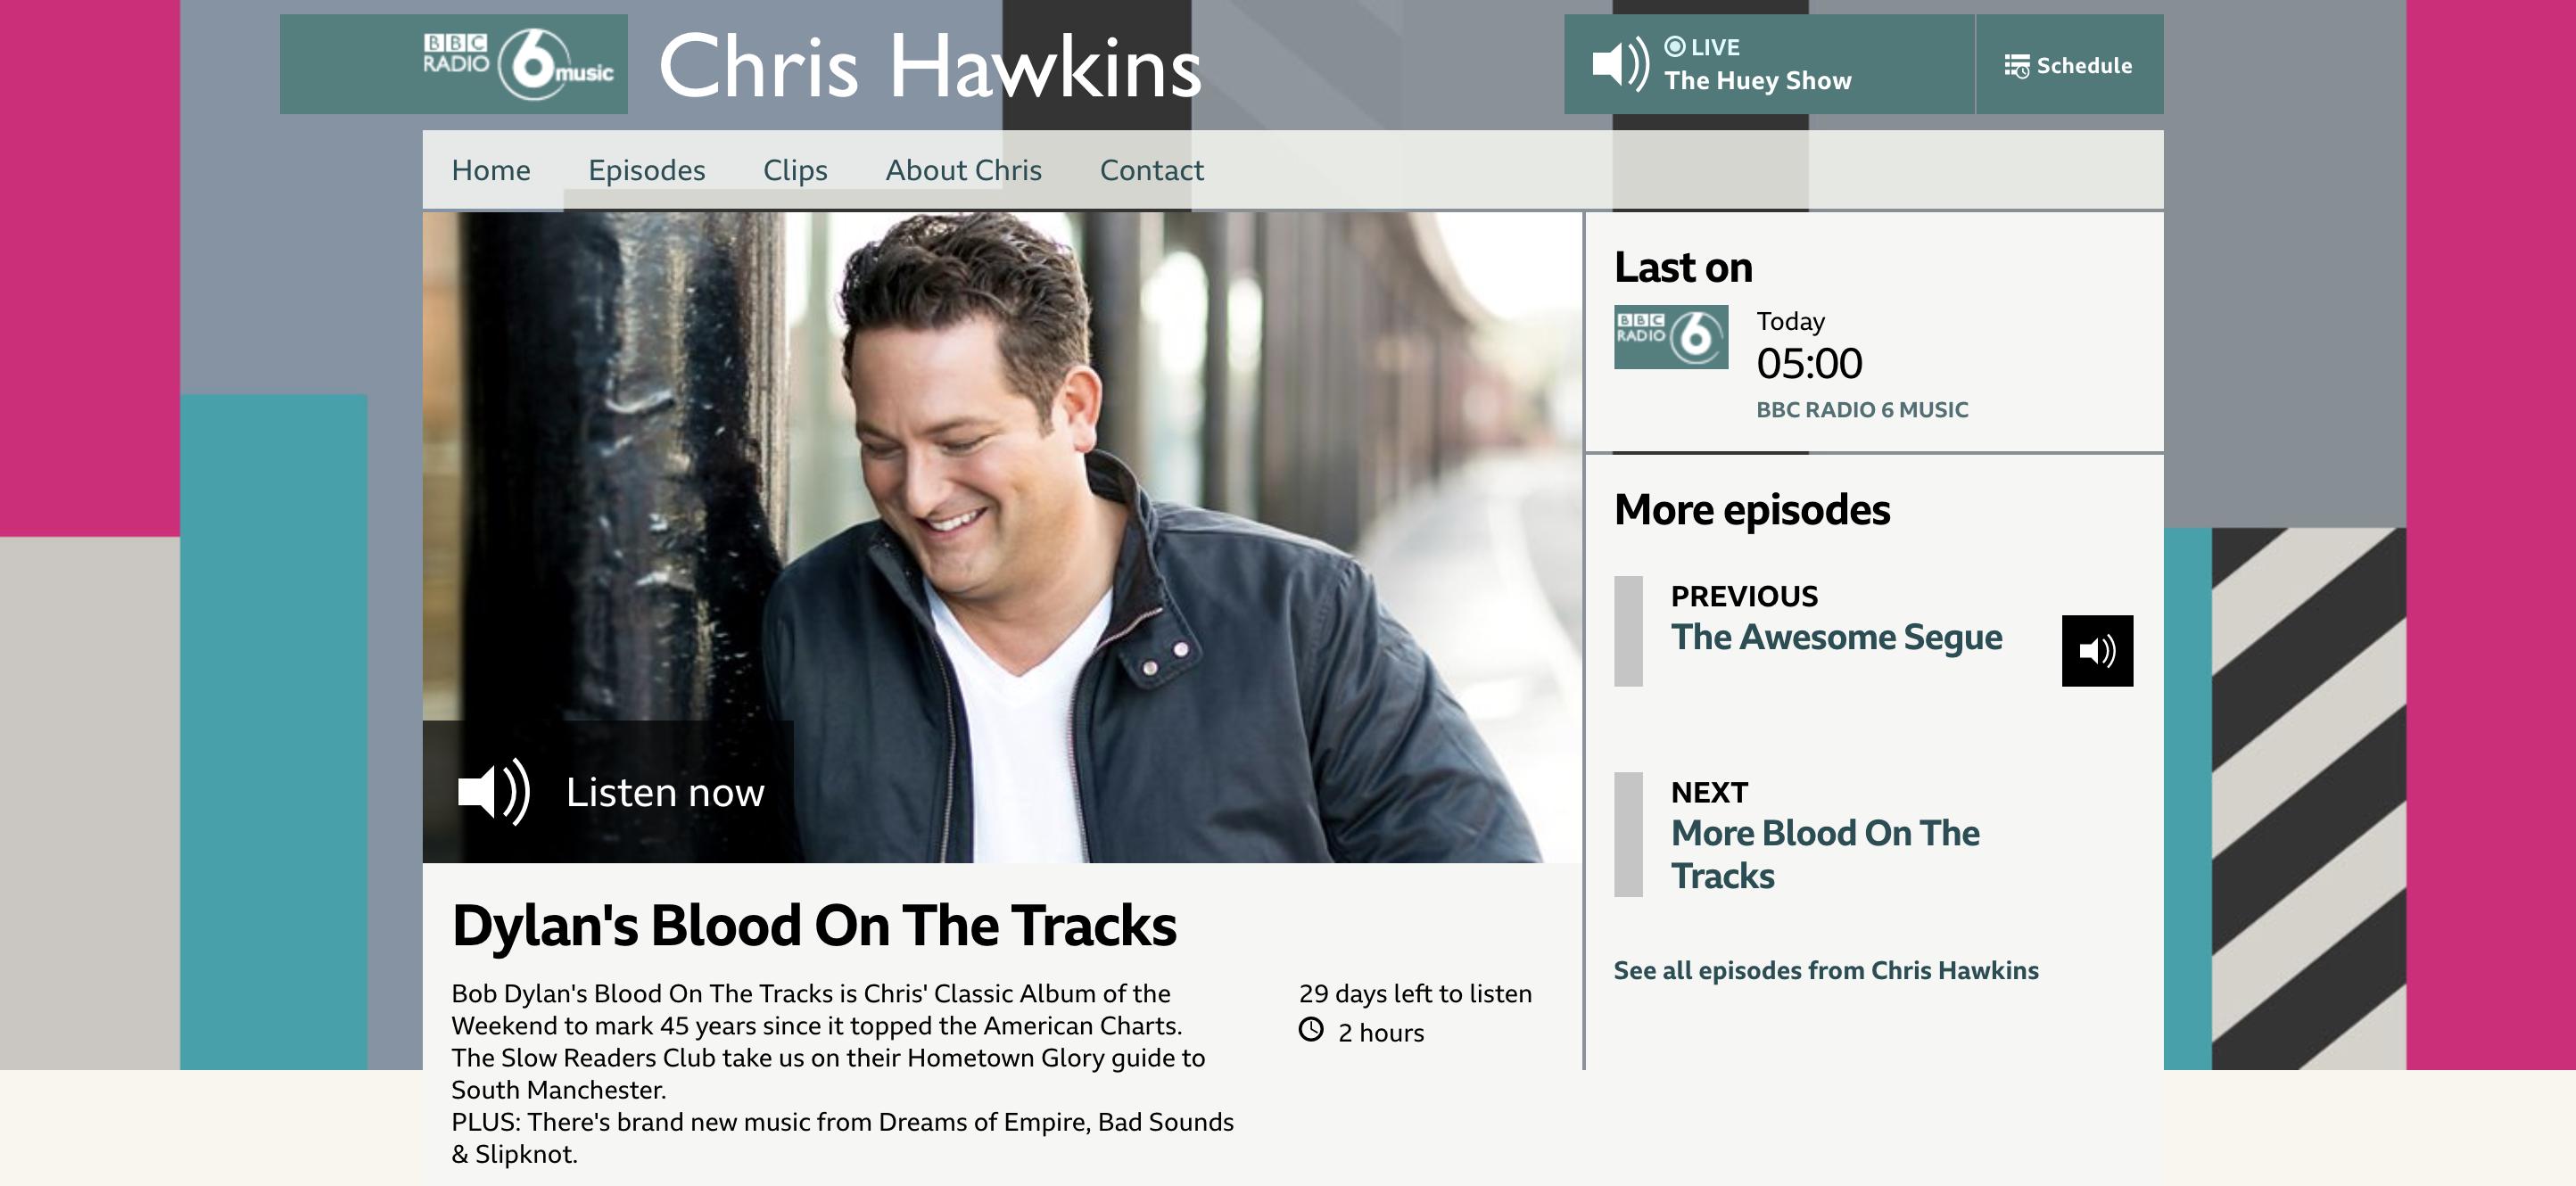 BBC Radio 6 Music DJ Chris Hawkins